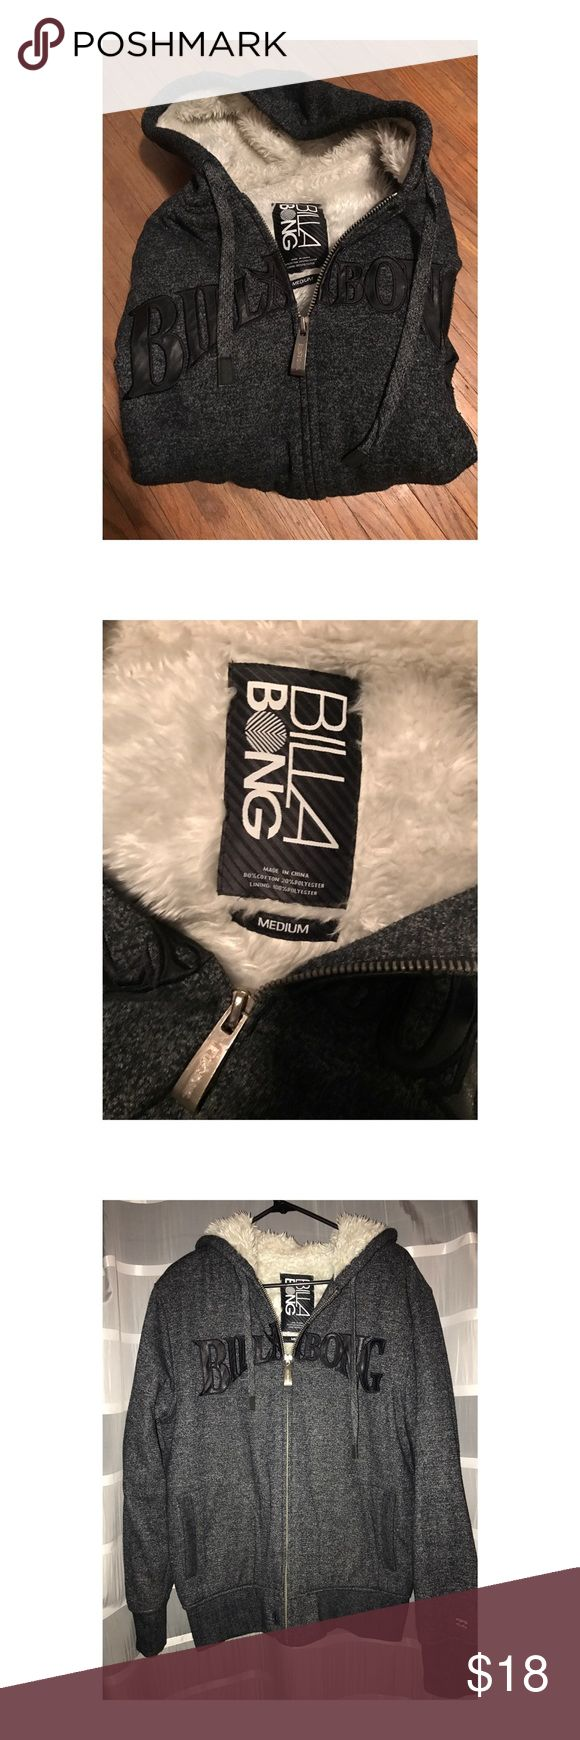 Men's Medium Faux Fur Blue Billabong Hoodie Gently worn faux fur blue zip up hoodie with bottle opener zipper Billabong Sweaters Zip Up